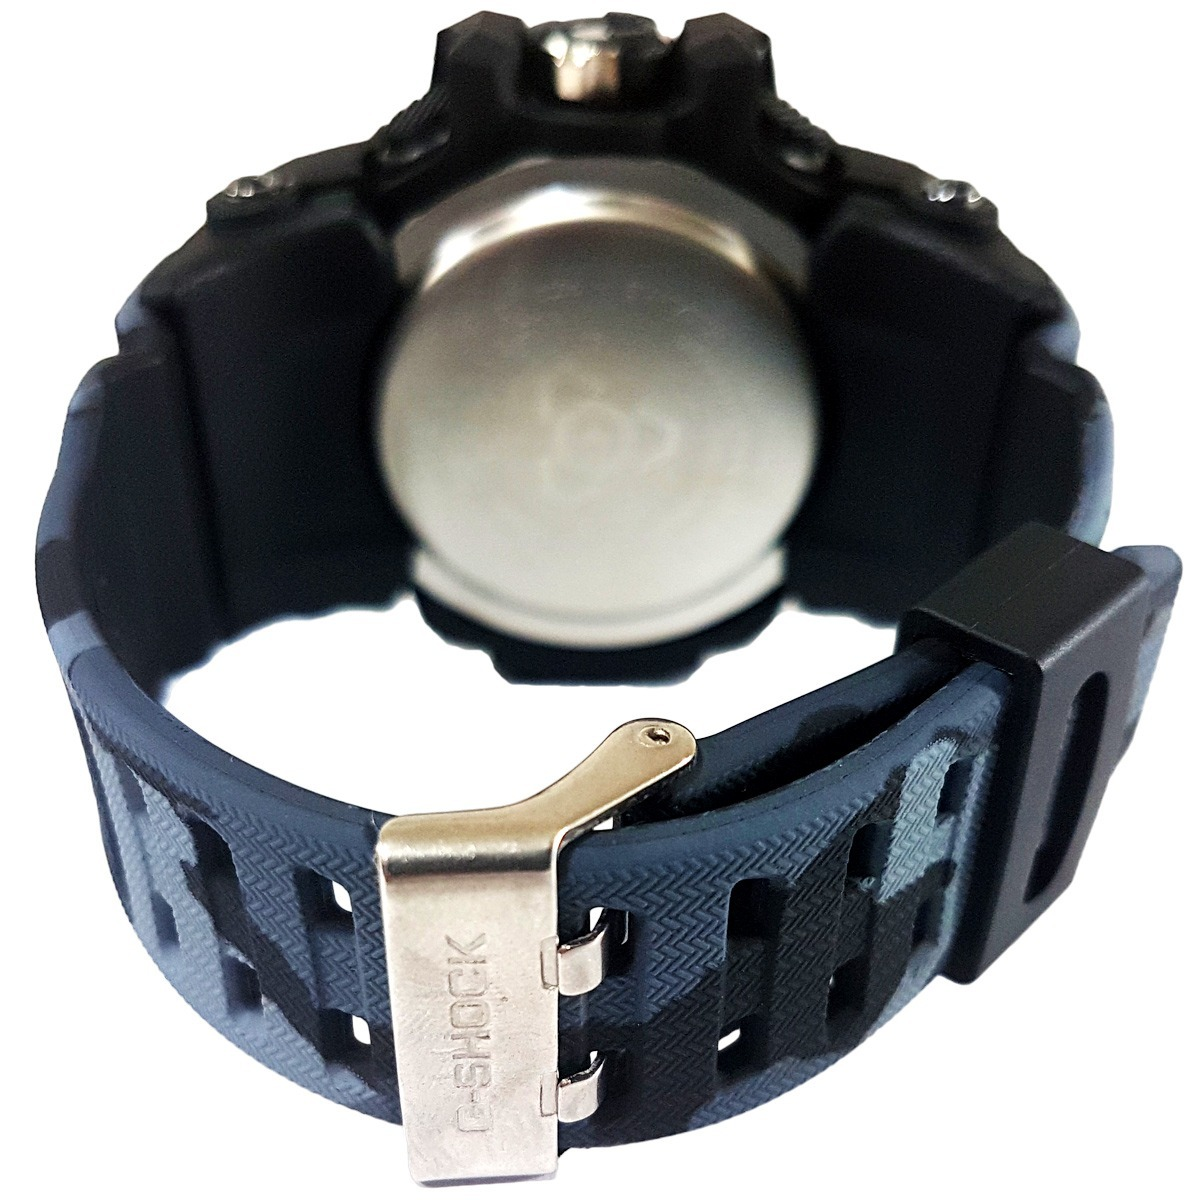 4f582017e1e relógio casio g shock masculino digital esporte sport barato. Carregando  zoom.